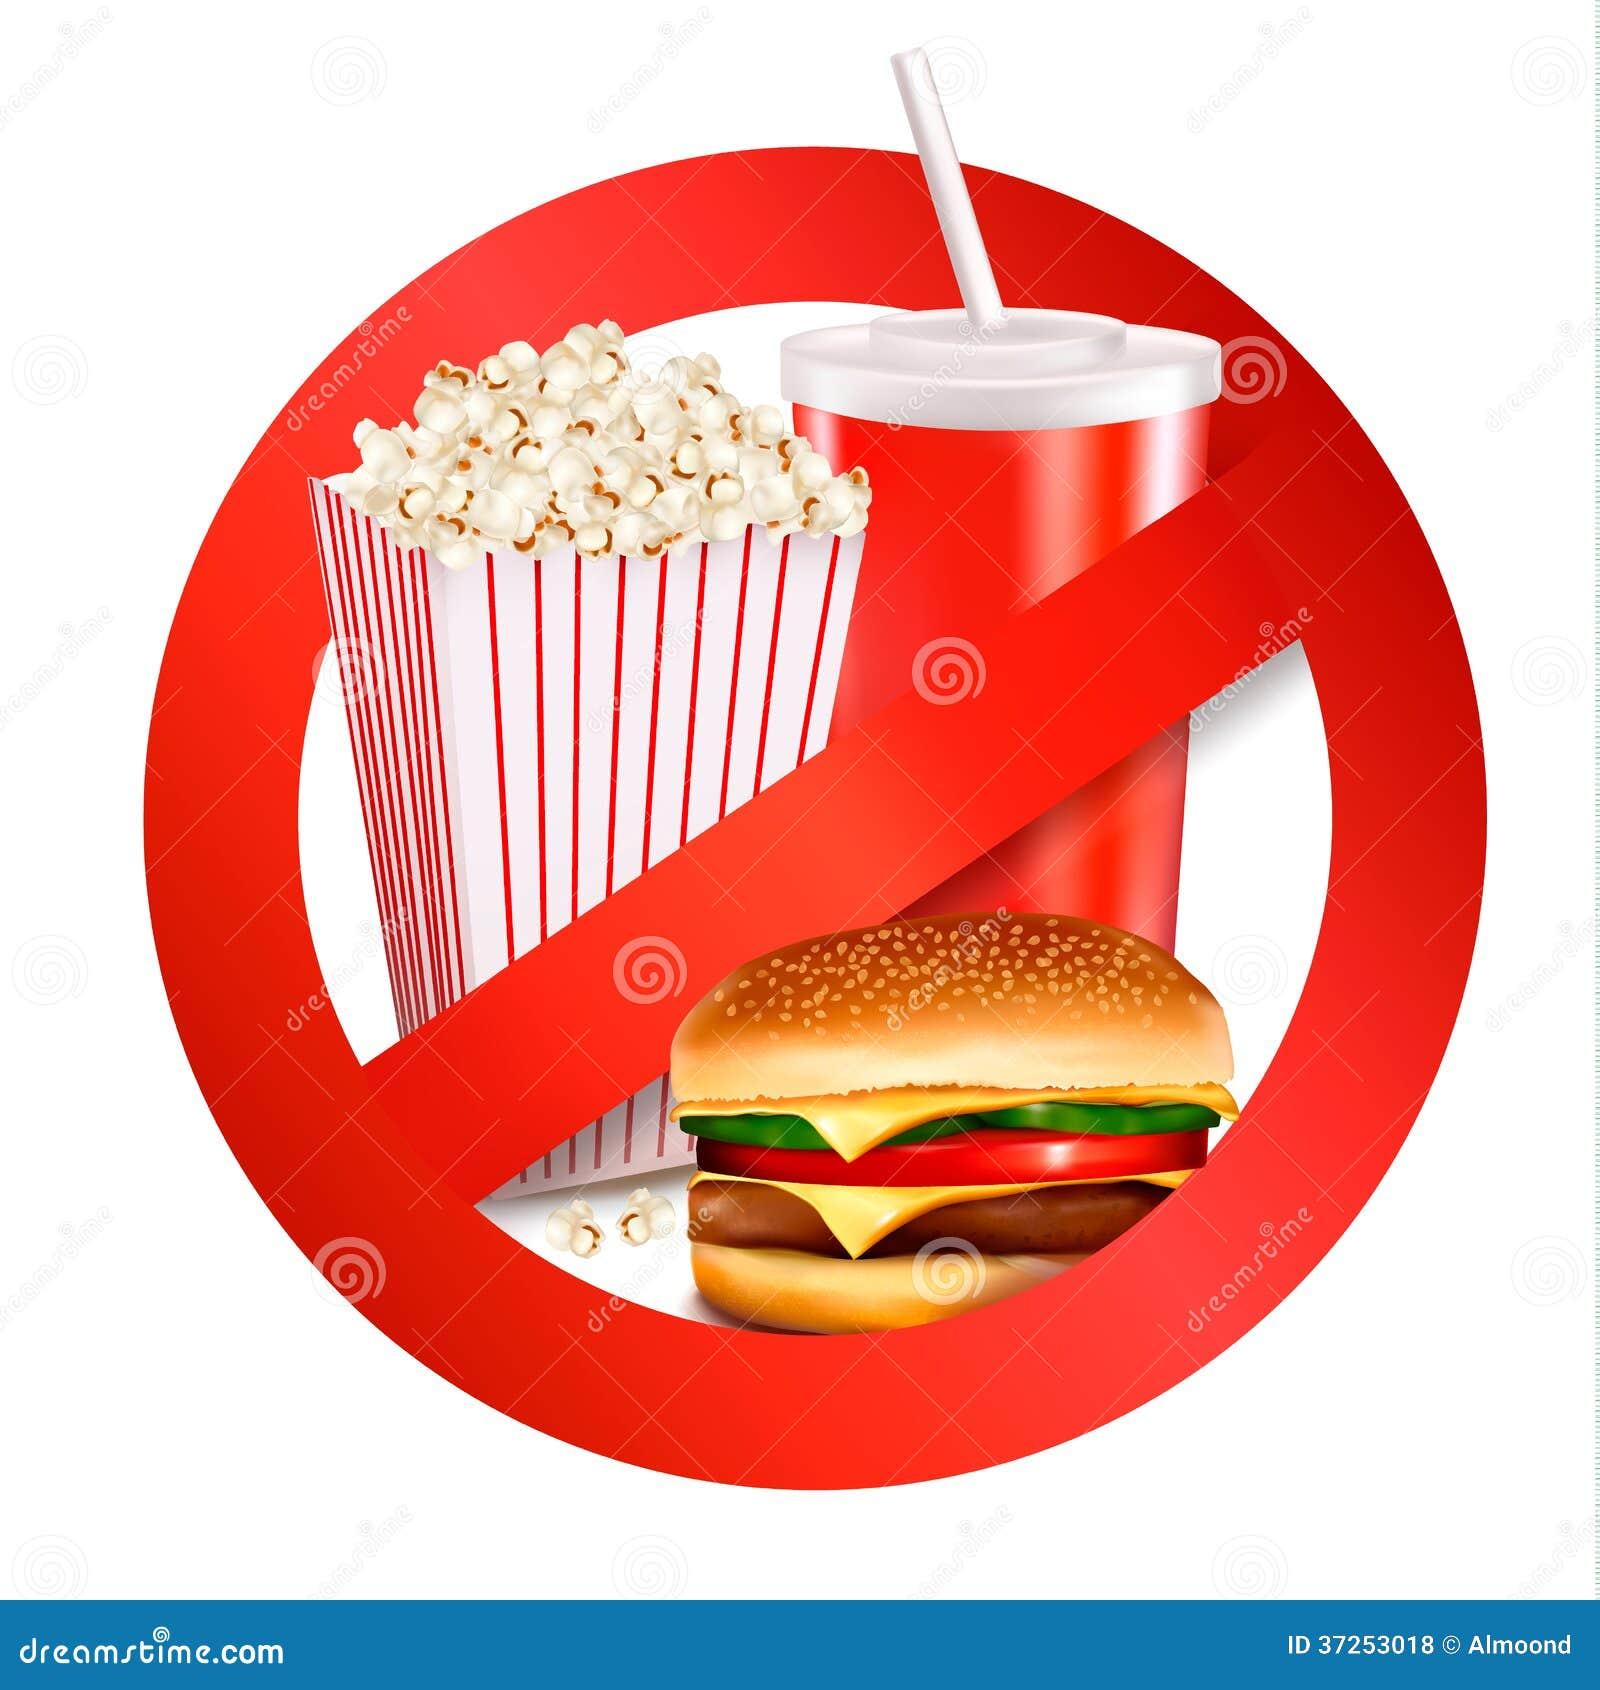 No Junk Food Diet